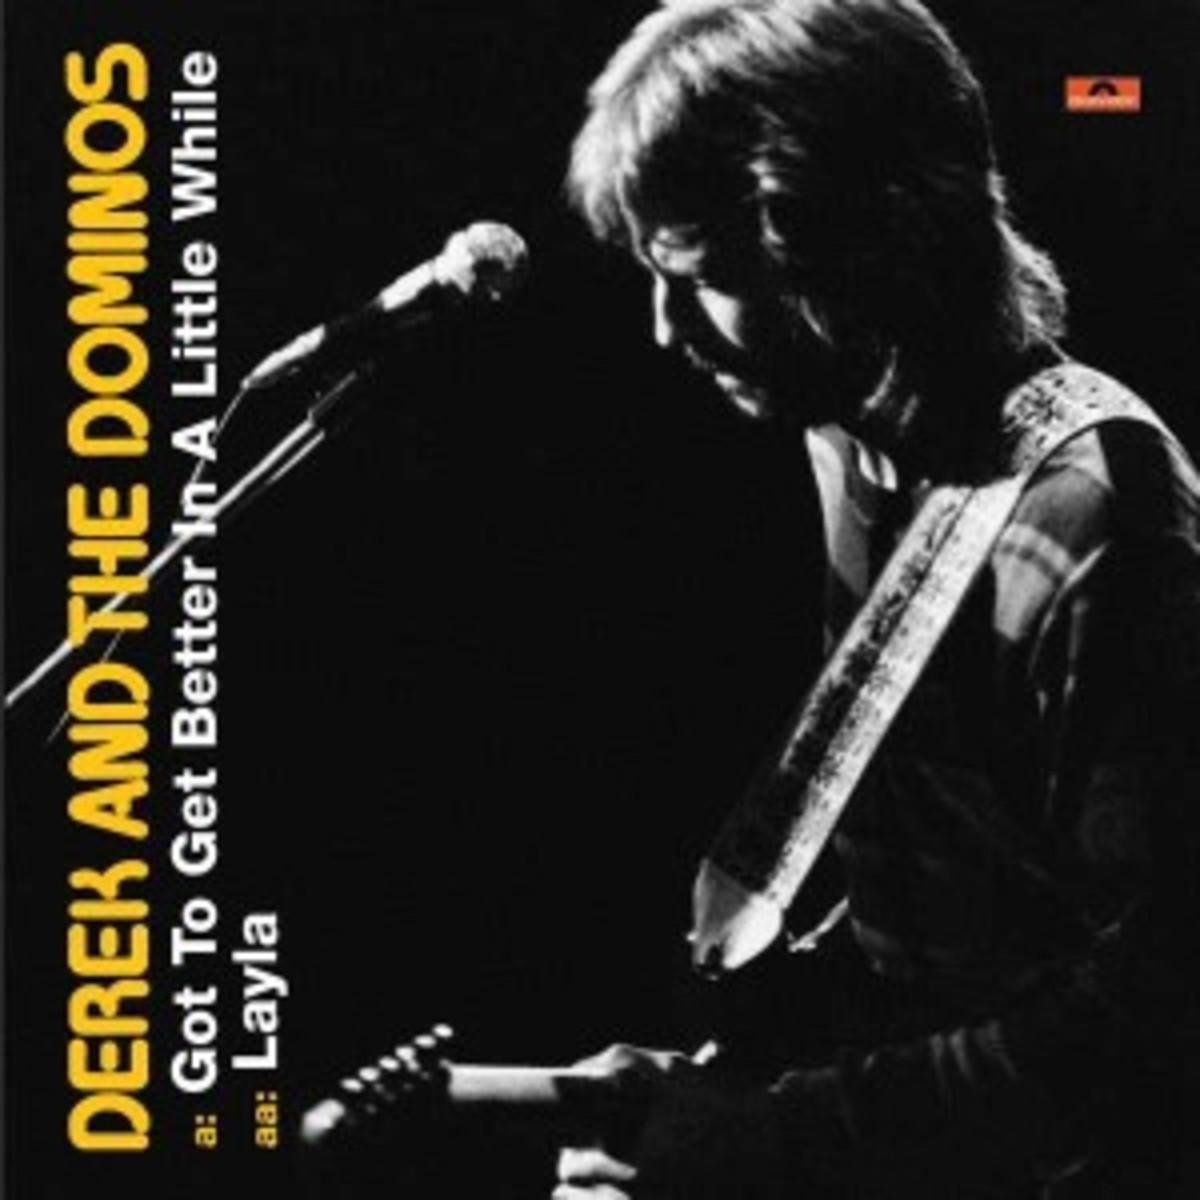 Derek_Dominos